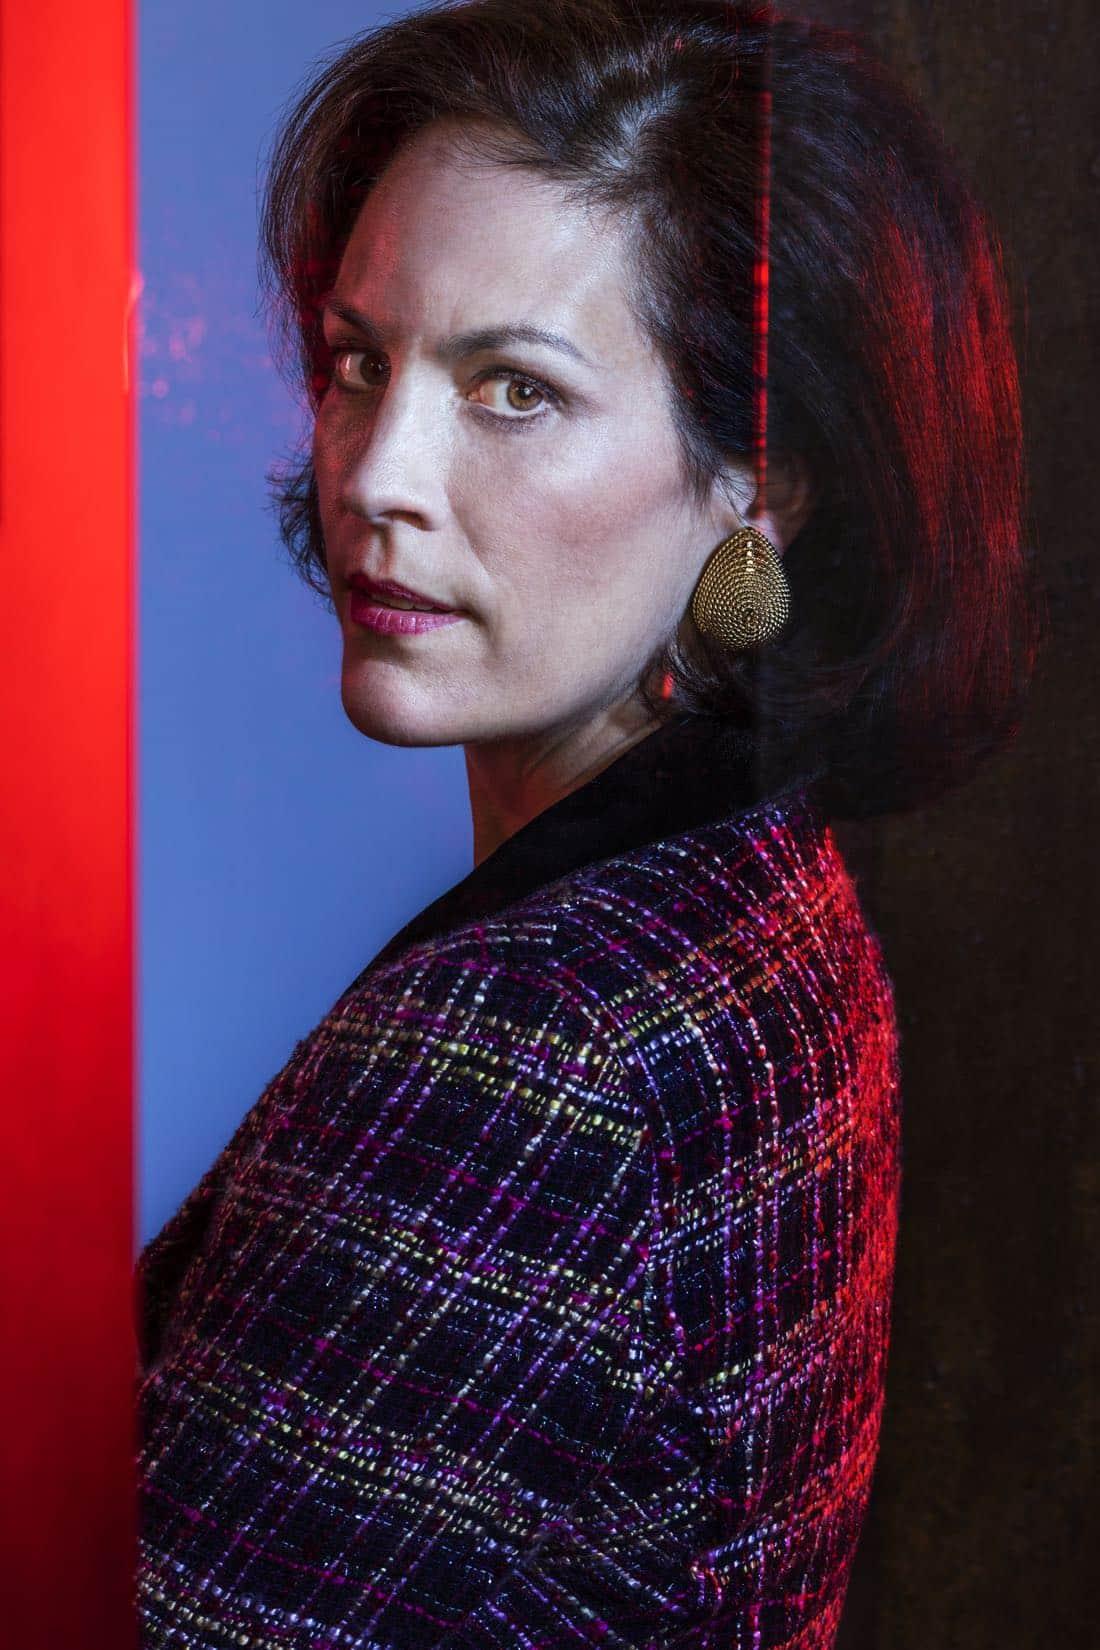 Elizabeth Gish as Diane; single- Halt and Catch Fire _ Season 4, Gallery - Photo Credit: Eric Ogden/AMC